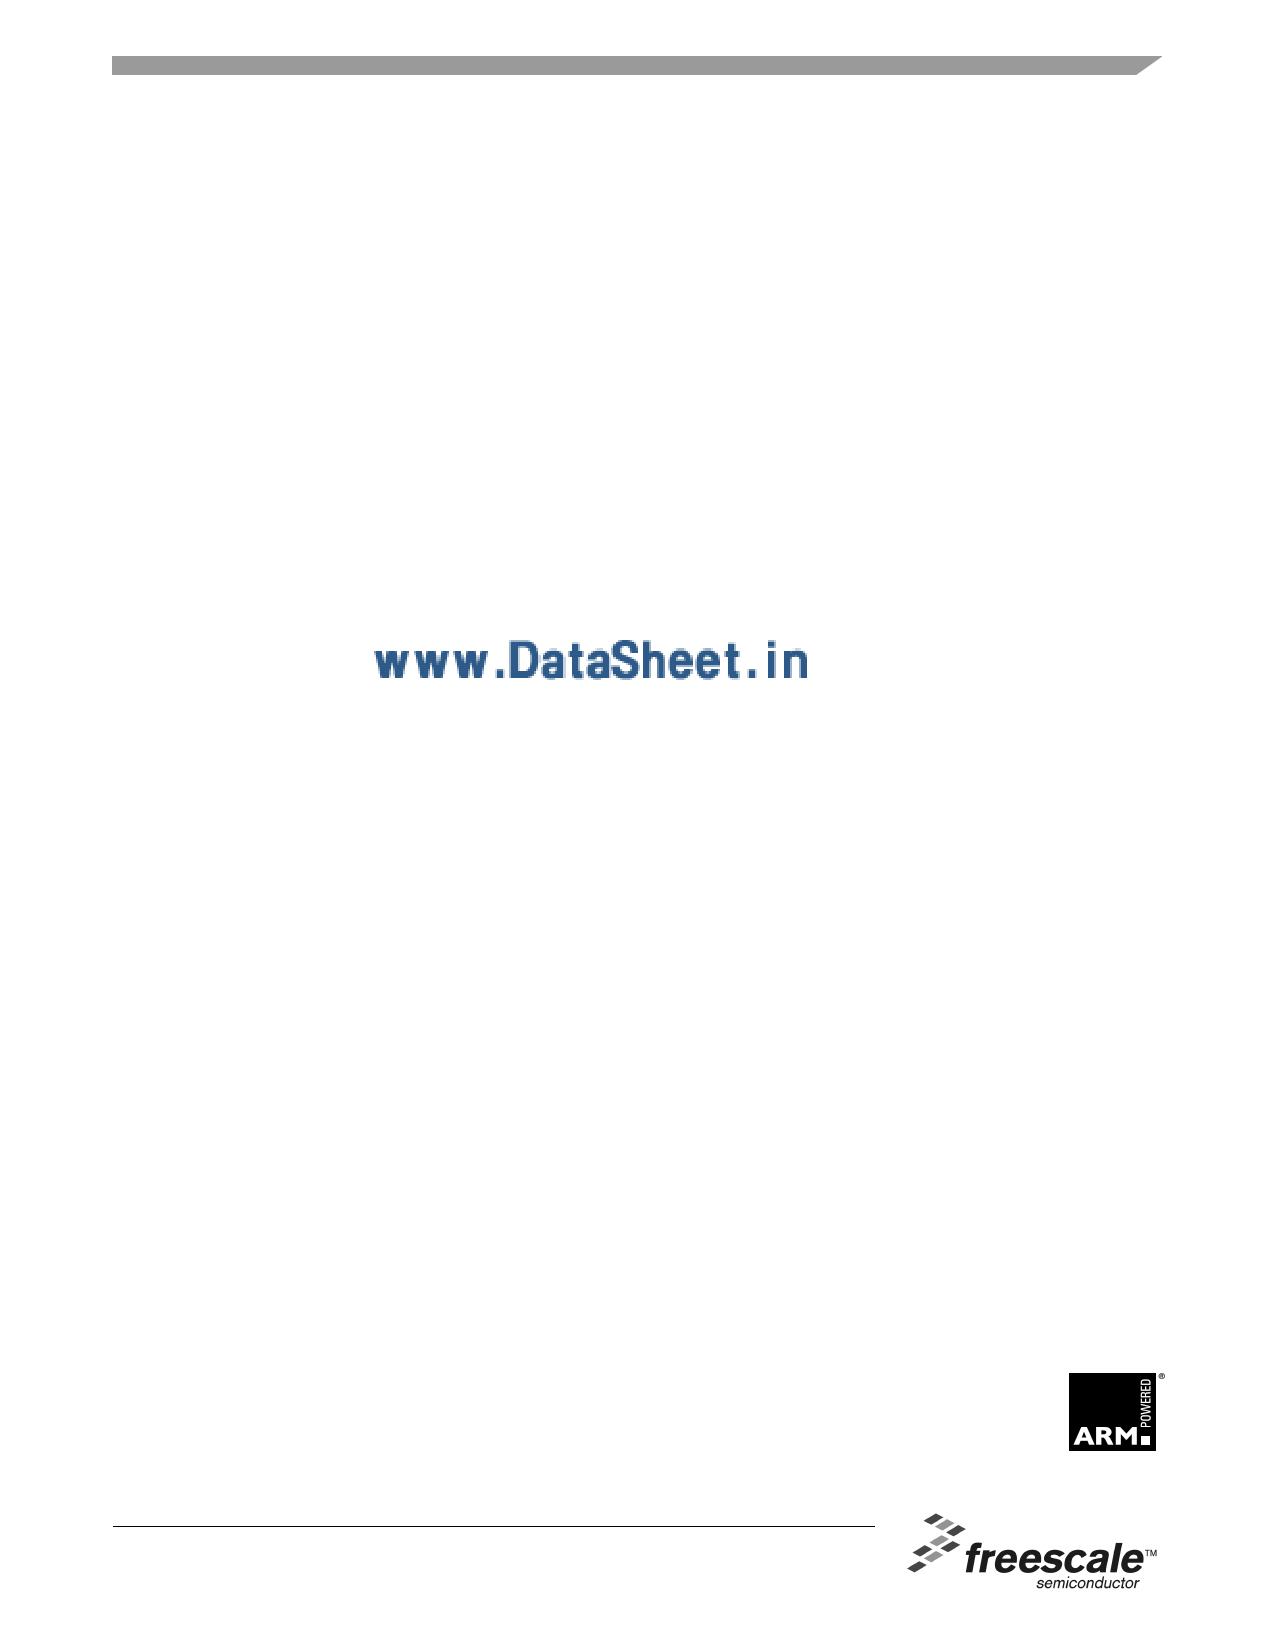 I.MX31L datasheet